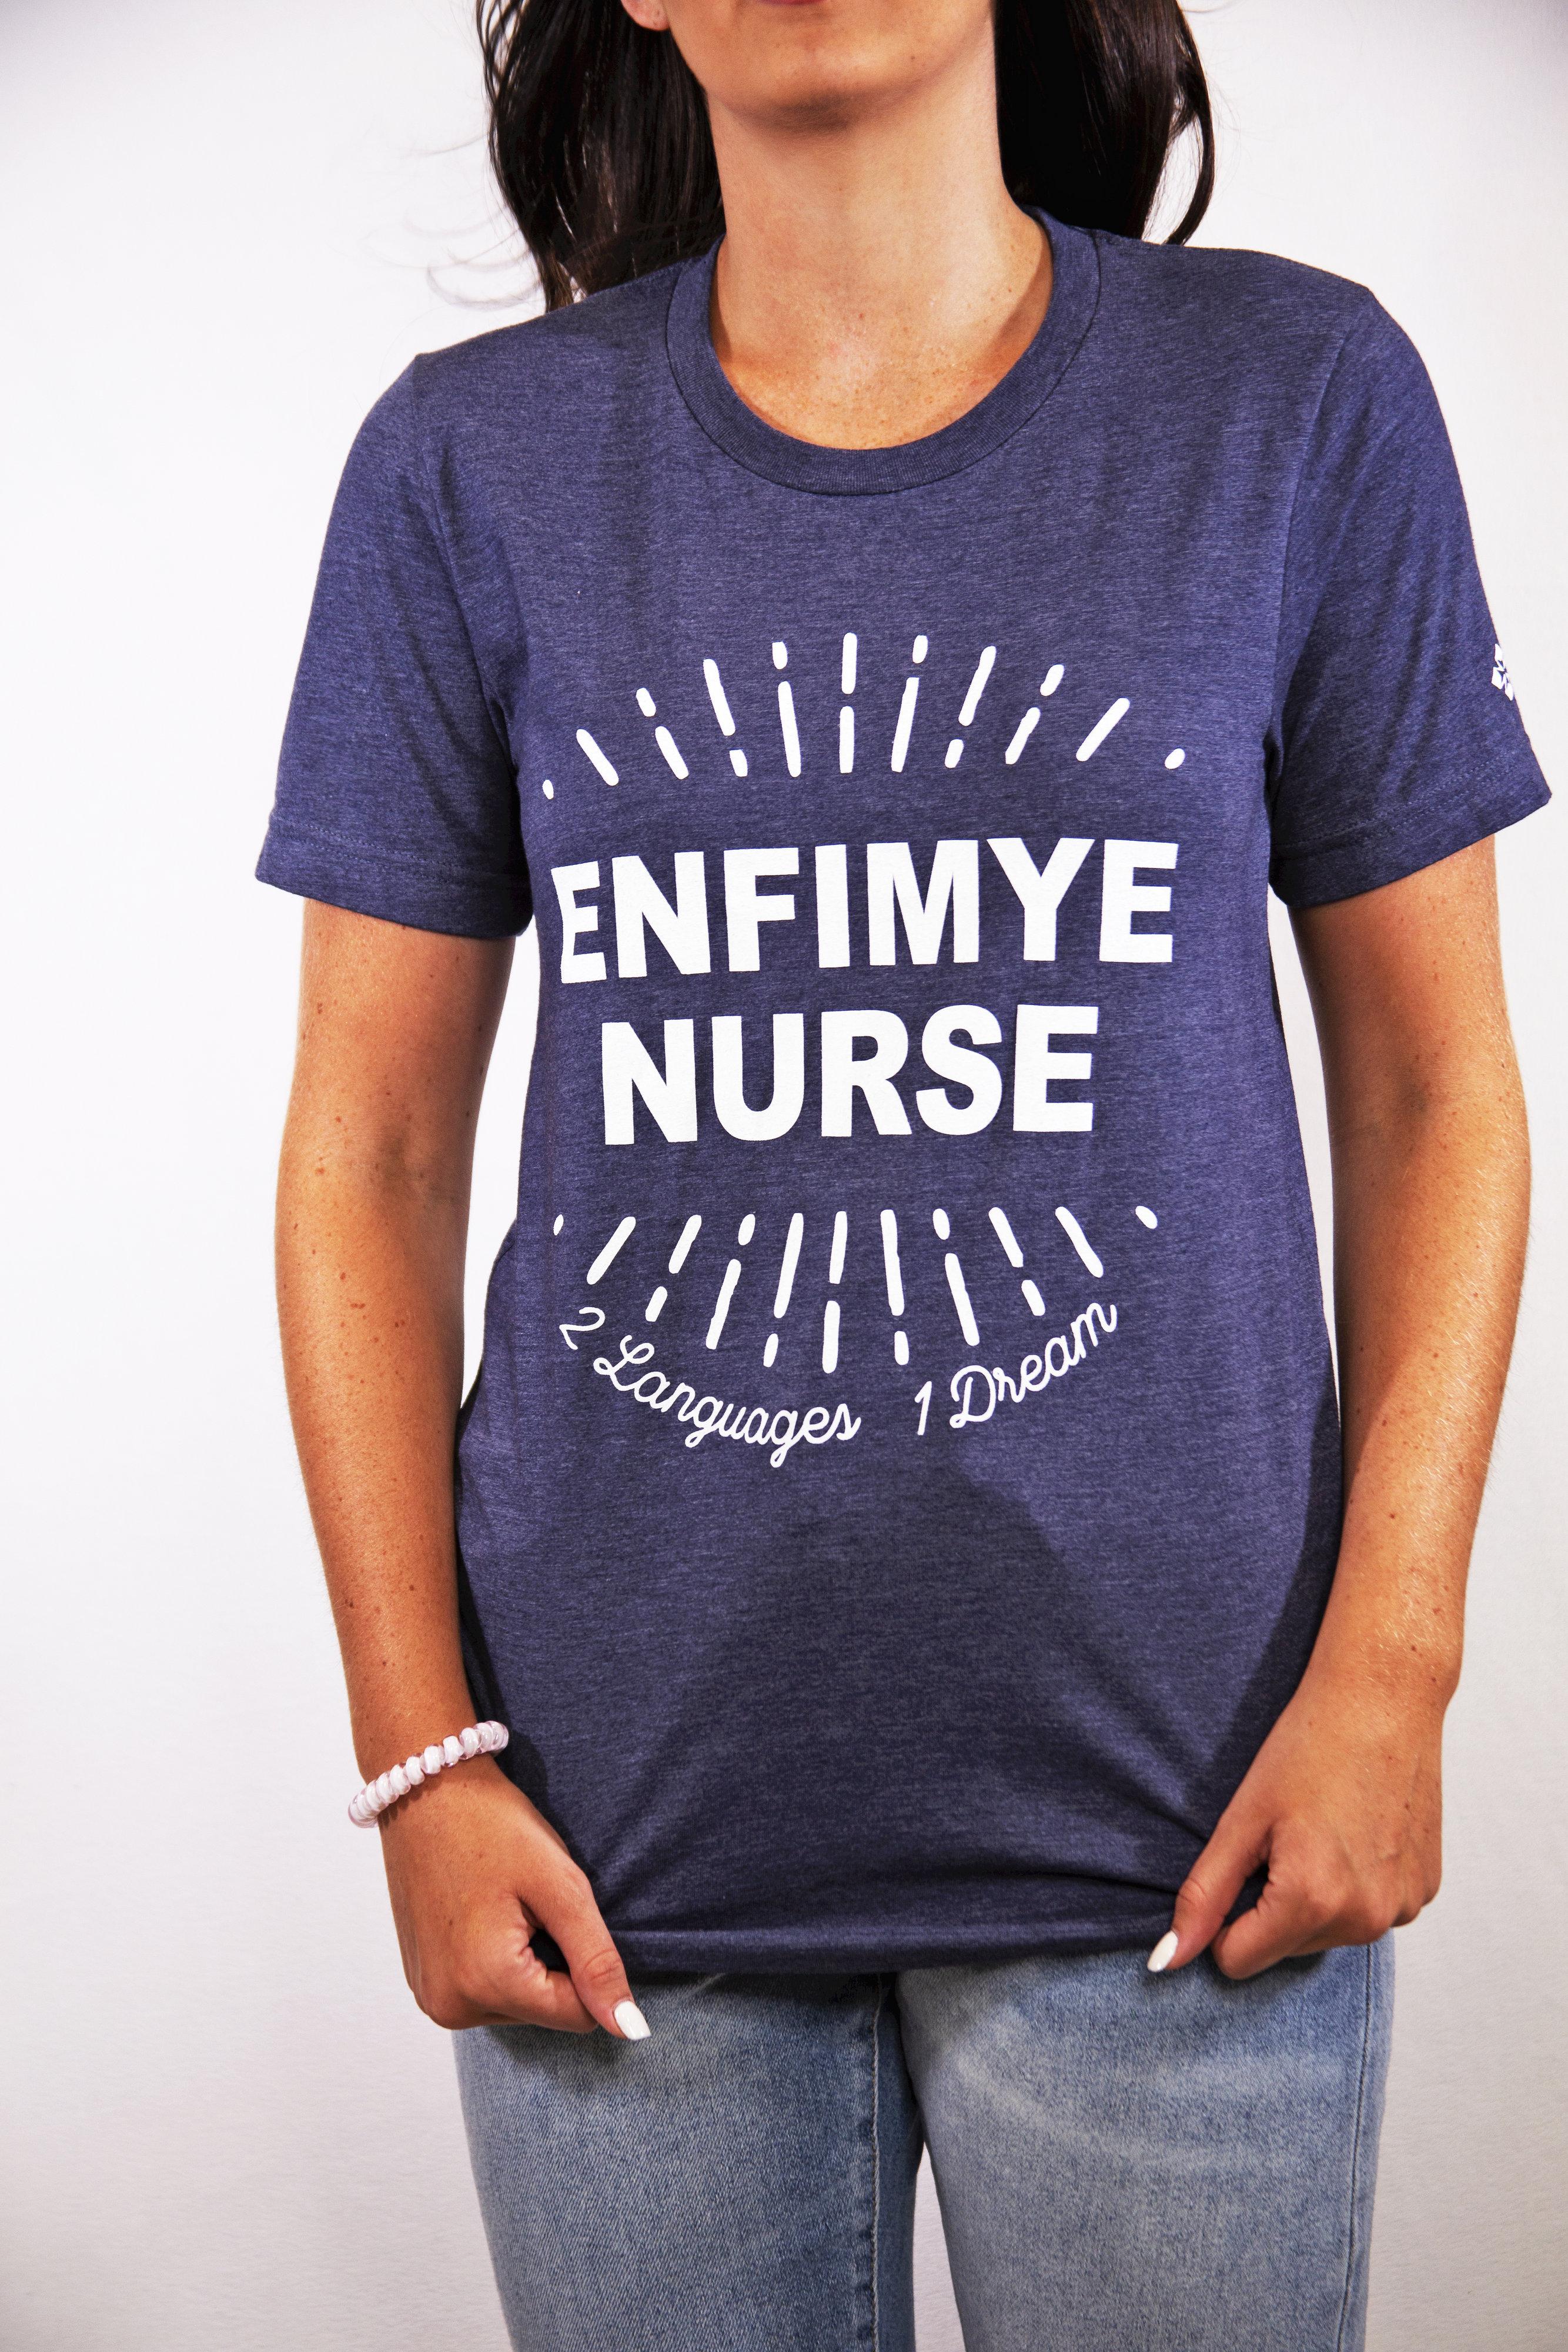 Haiti Nursing T-Shirt.  Purchase to support nursing students in Haiti!-Meridy's Pro